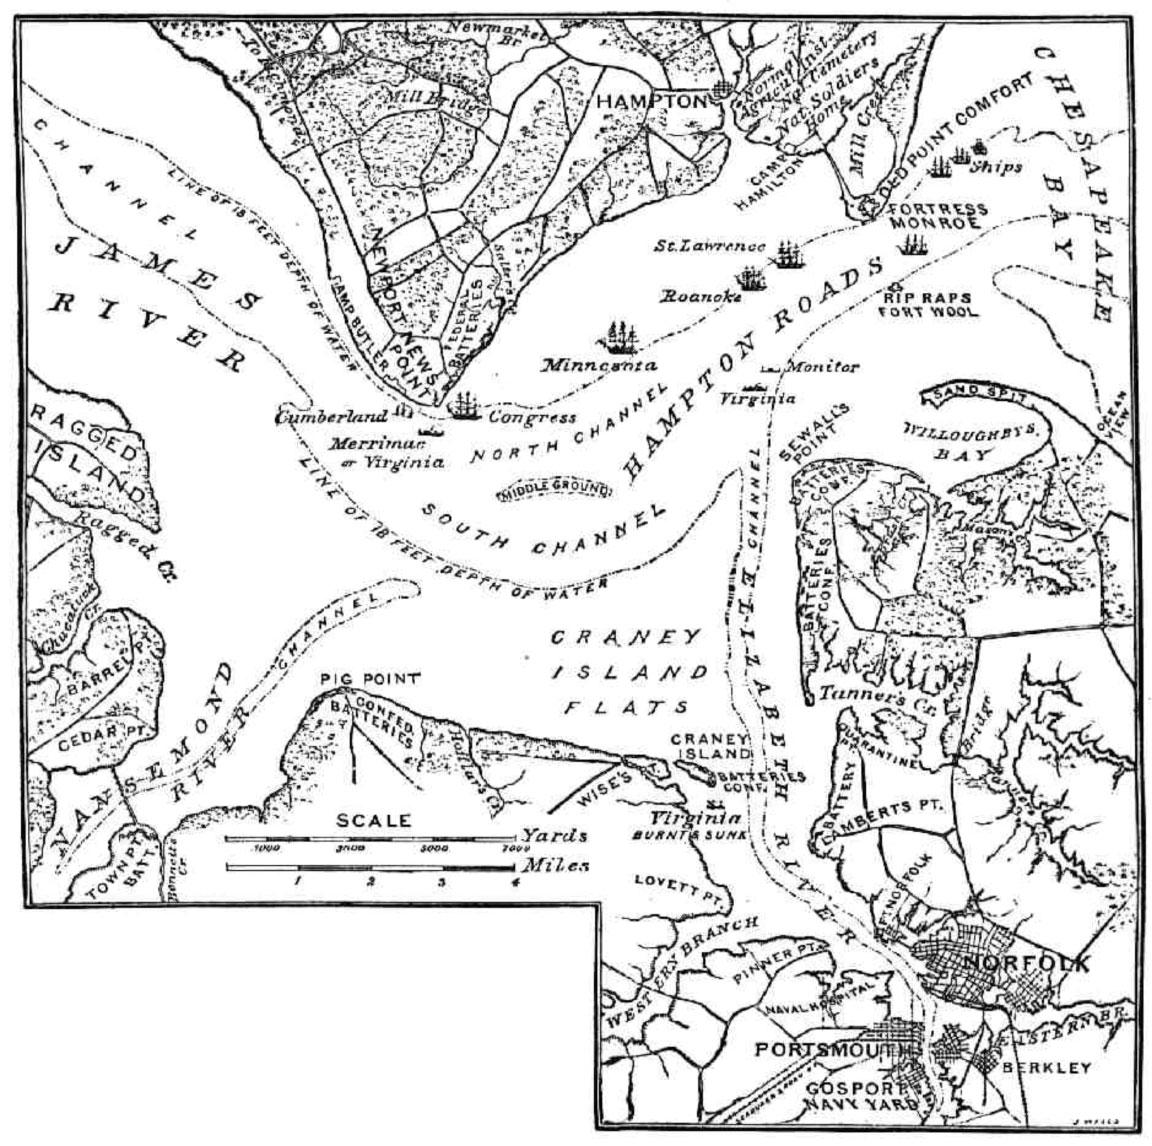 monitor 150th anniversary battle of h ton roads Magazine Racks click here